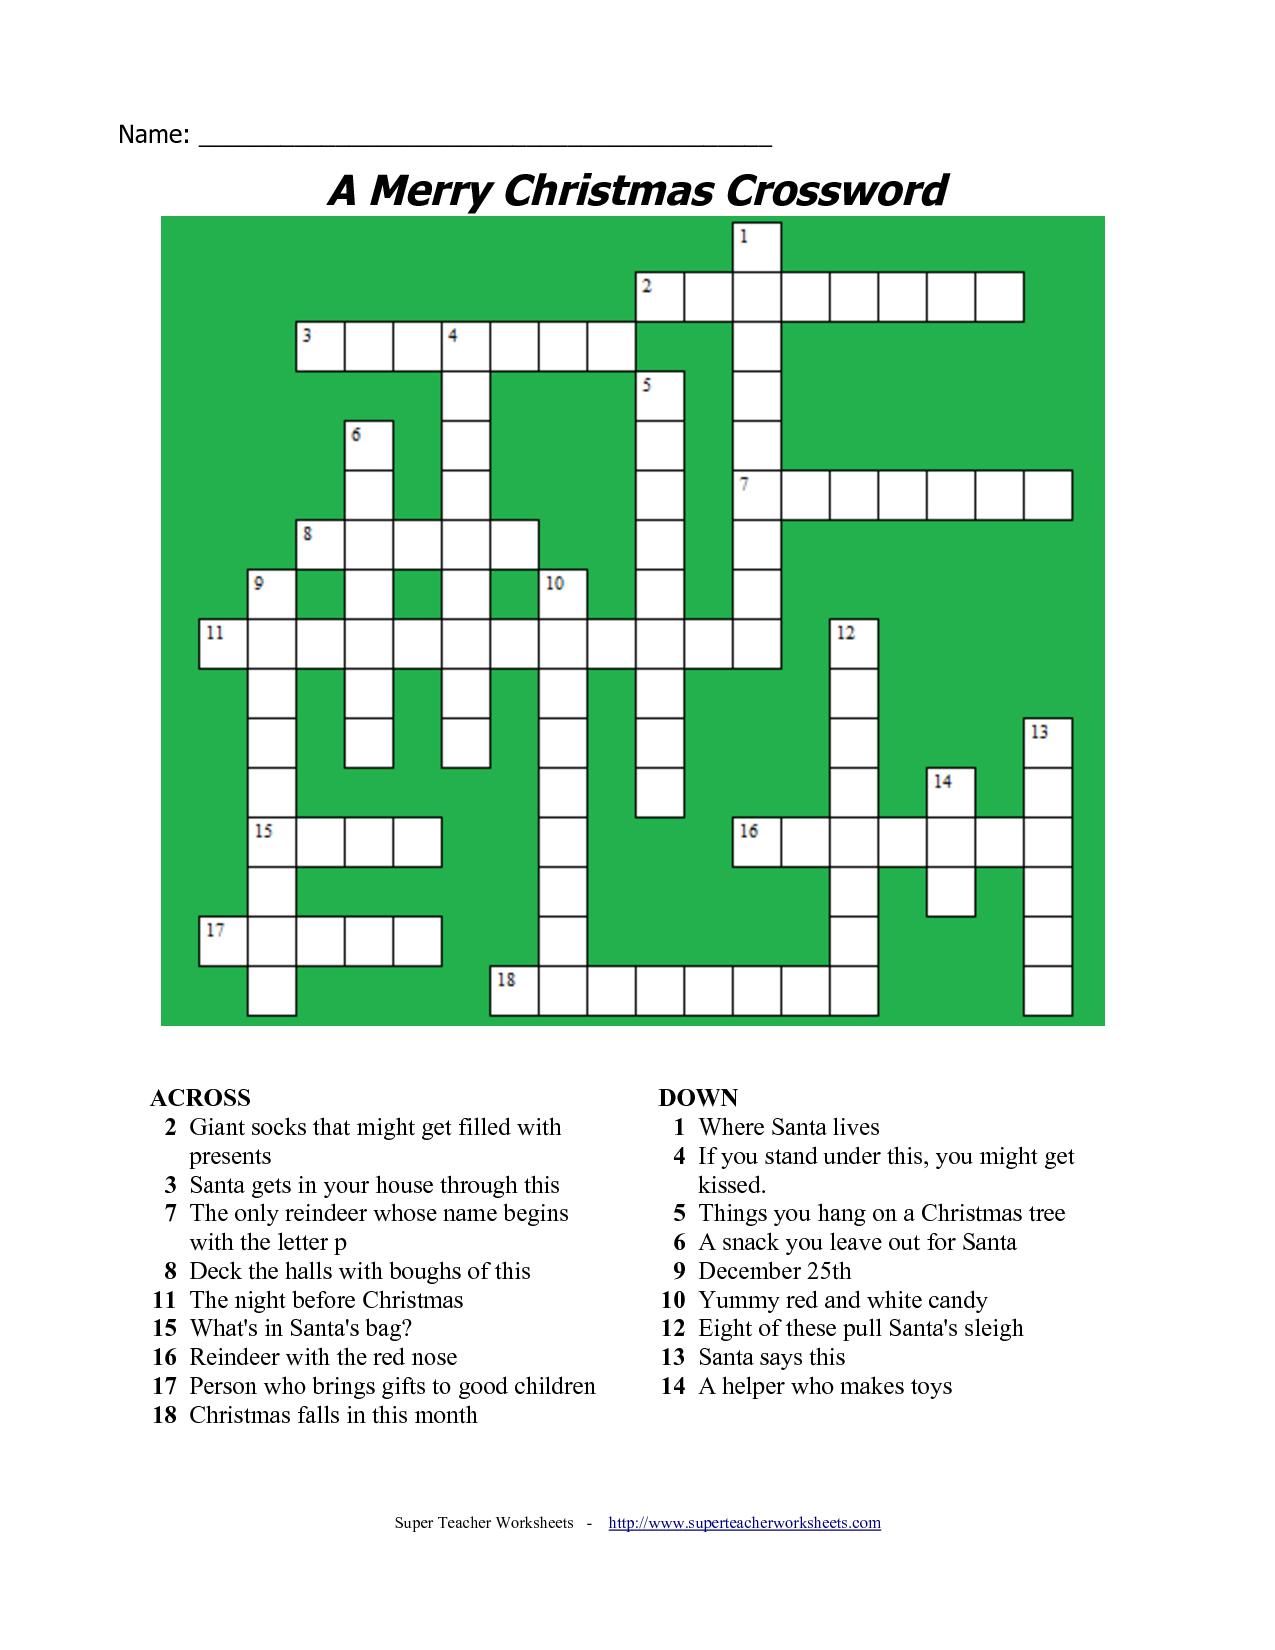 20 Fun Printable Christmas Crossword Puzzles | Kittybabylove - Printable Xmas Puzzles